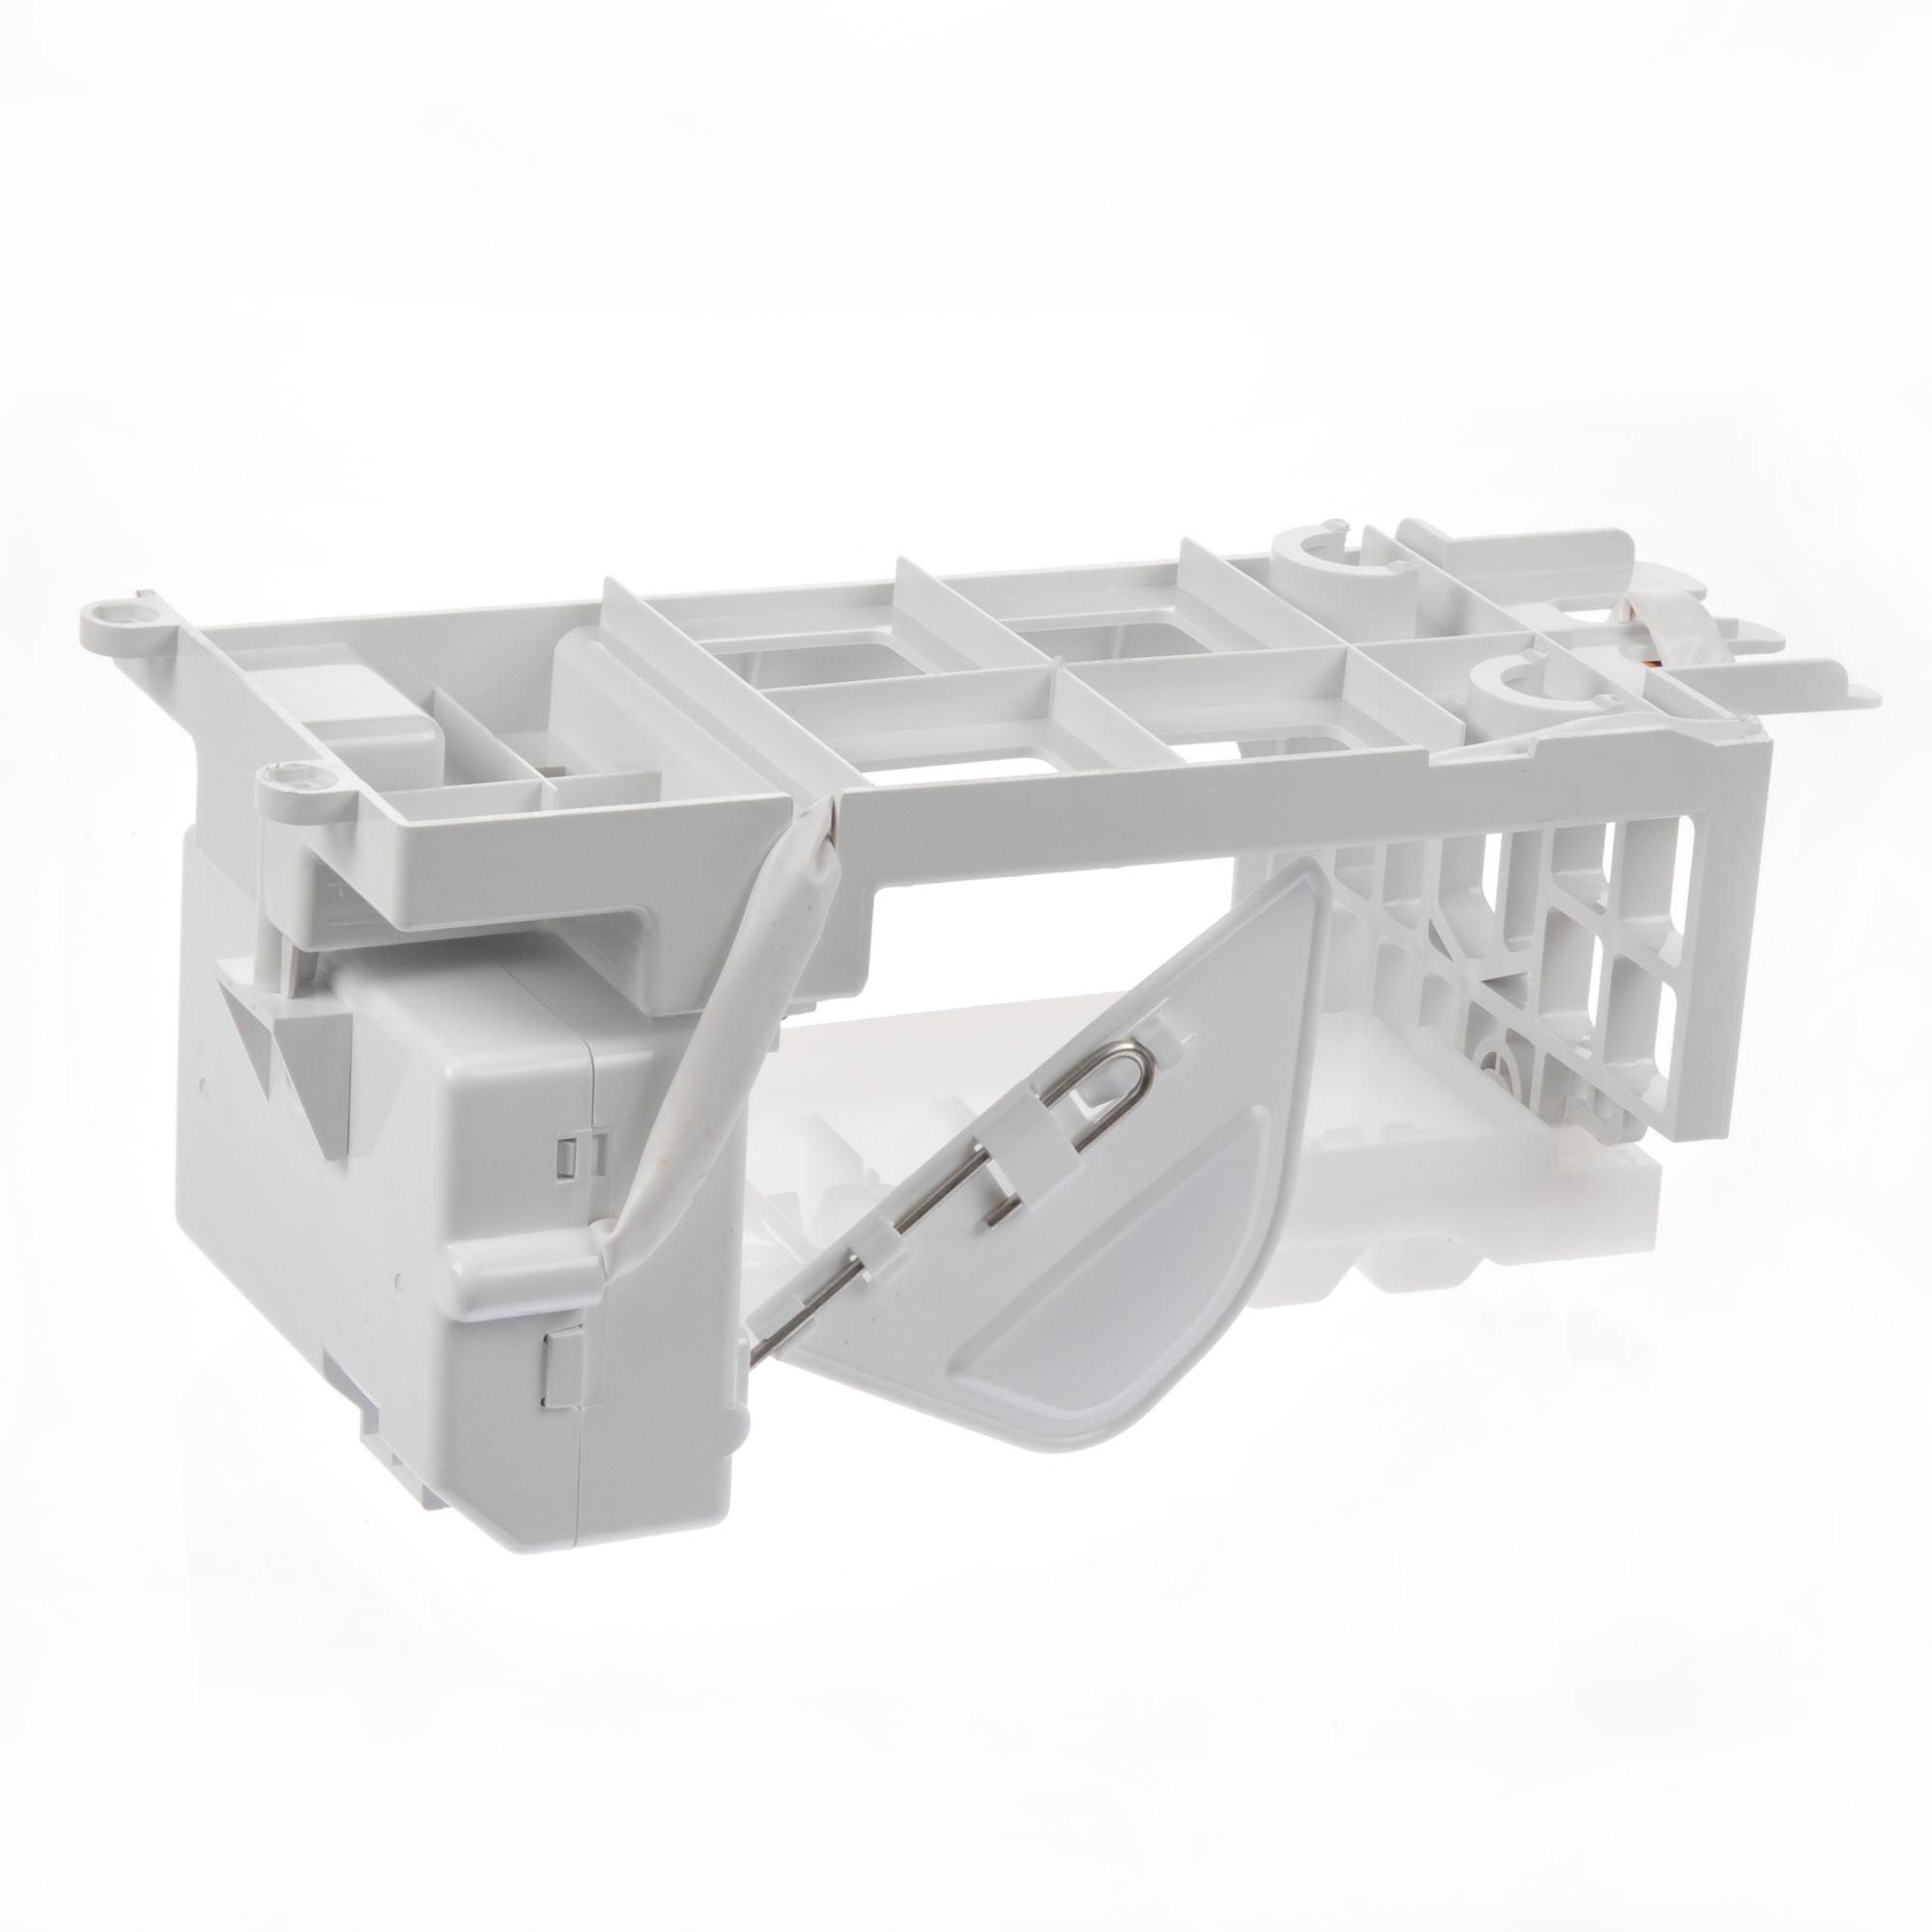 00649288 For Bosch Refrigerator Icemaker